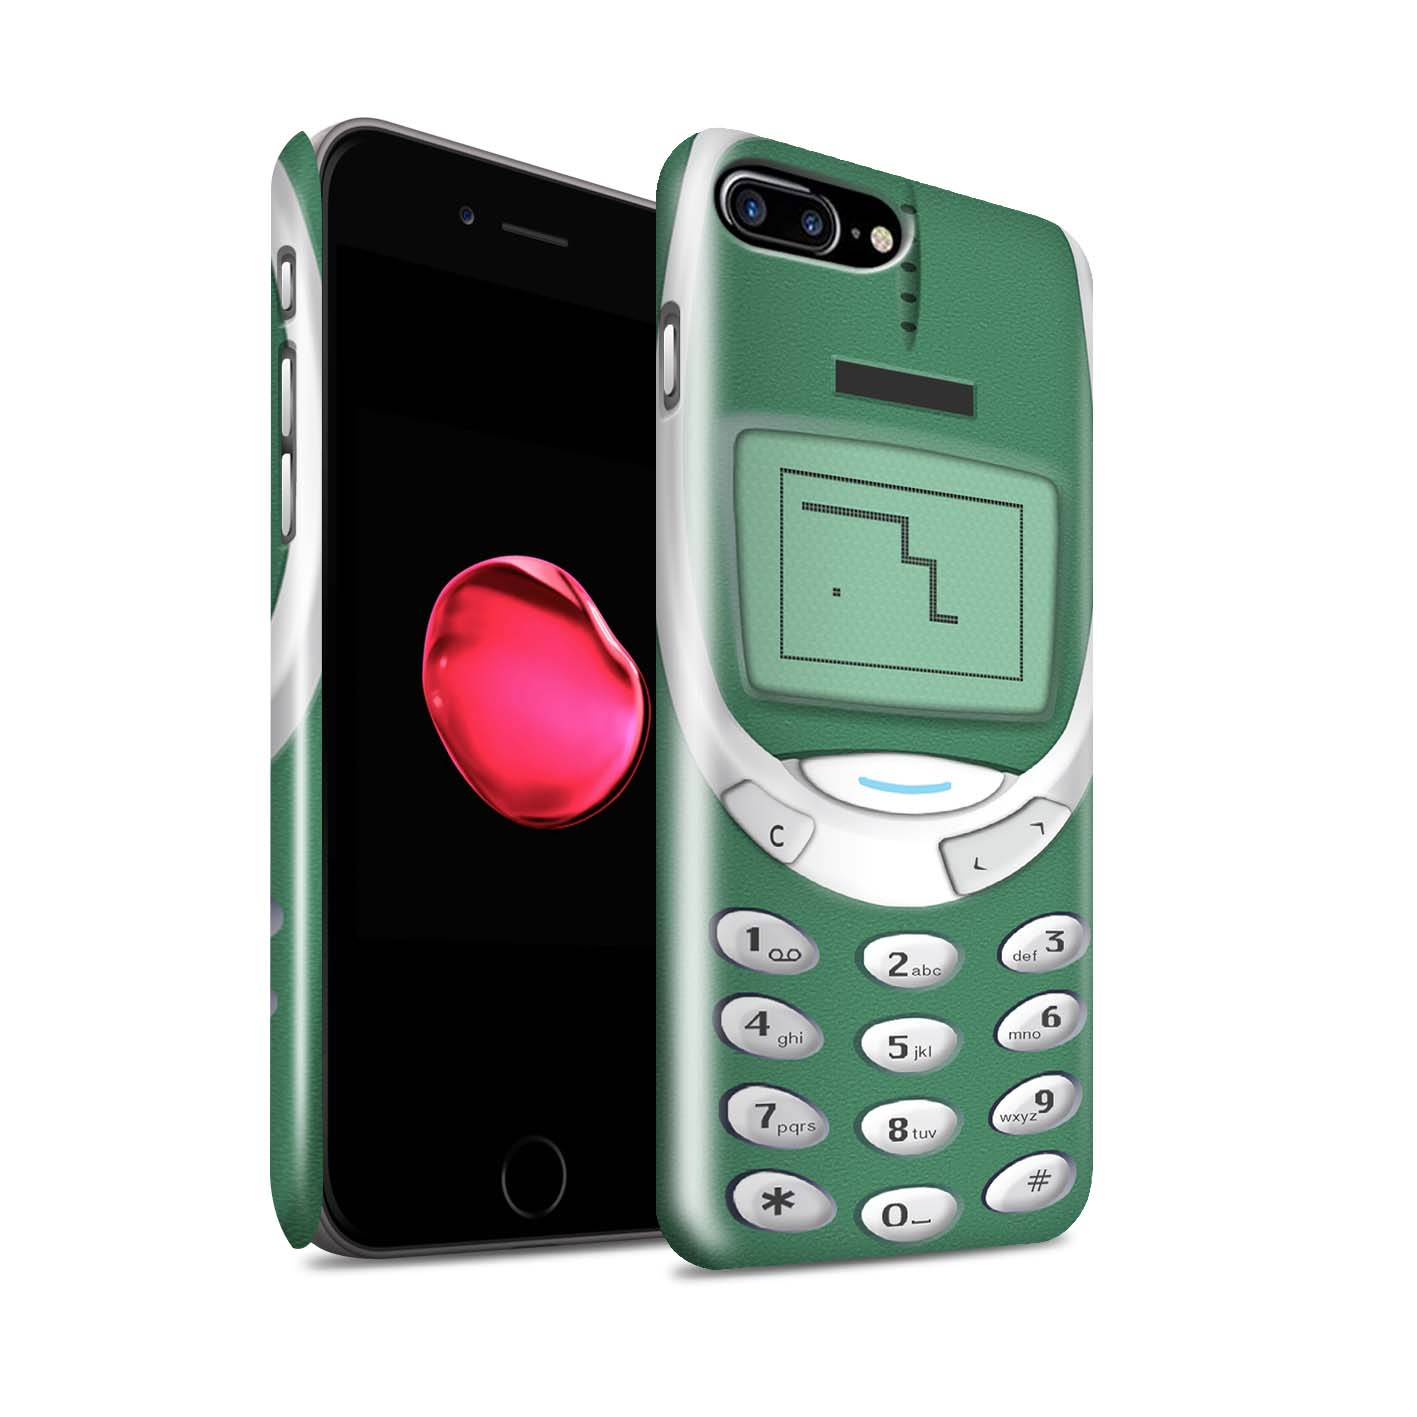 Coque-Etui-Brillant-de-STUFF4-pour-Apple-iPhone-7-Plus-Portables-retro